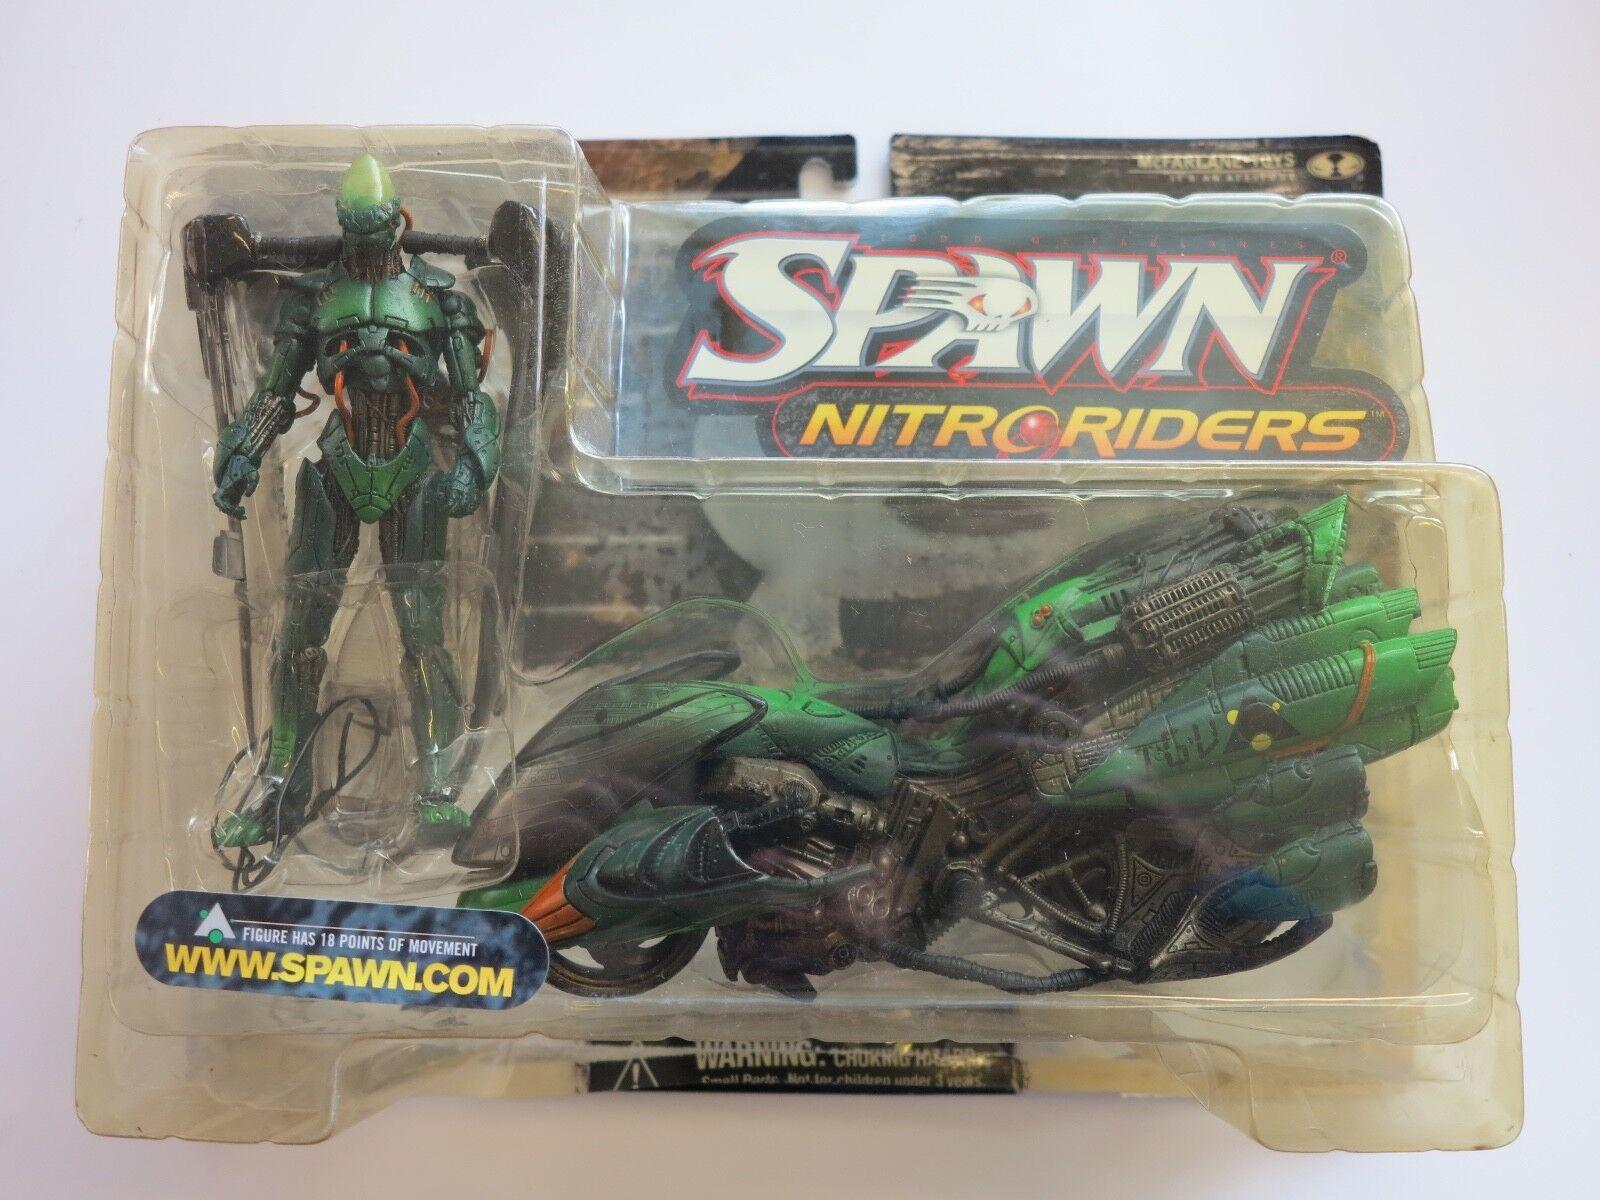 Rare 1999 SPAWN Nitro Riders figure set green vapor